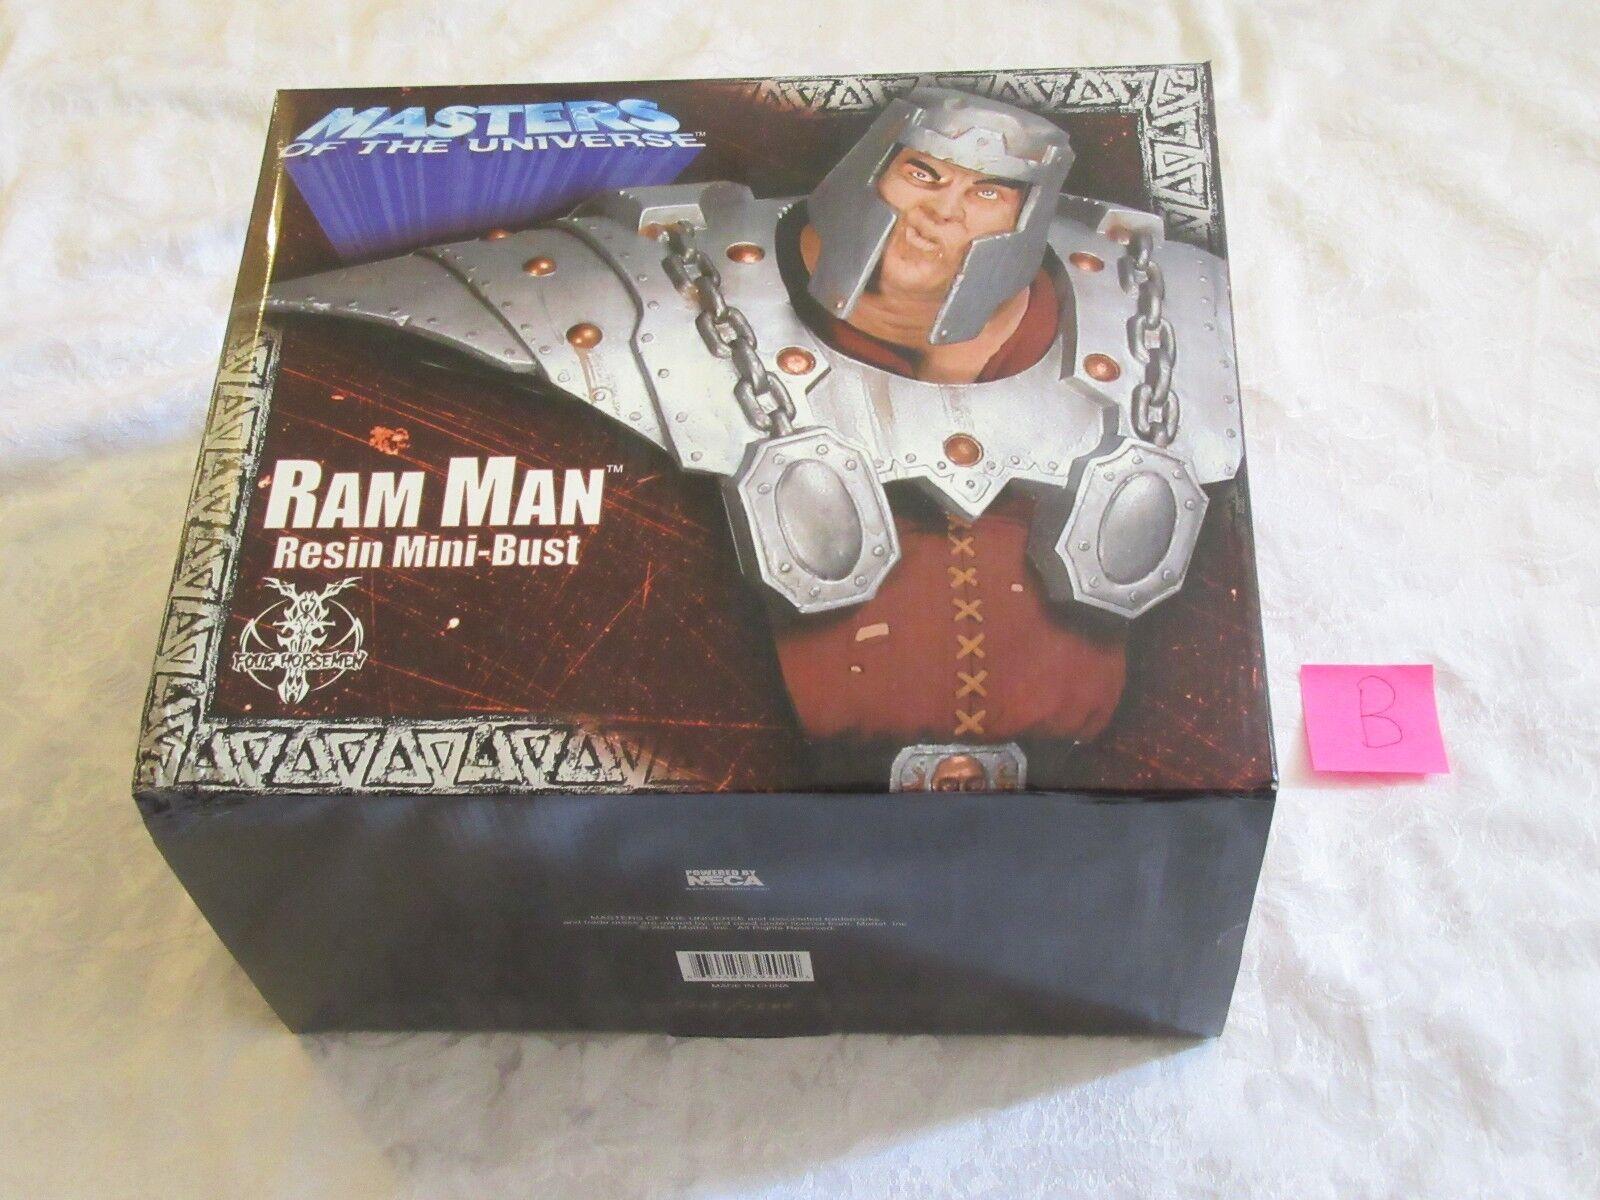 Neca Masters of the Universe MOTU Ram Man Resin Mini Bust Statue B  1705 2500